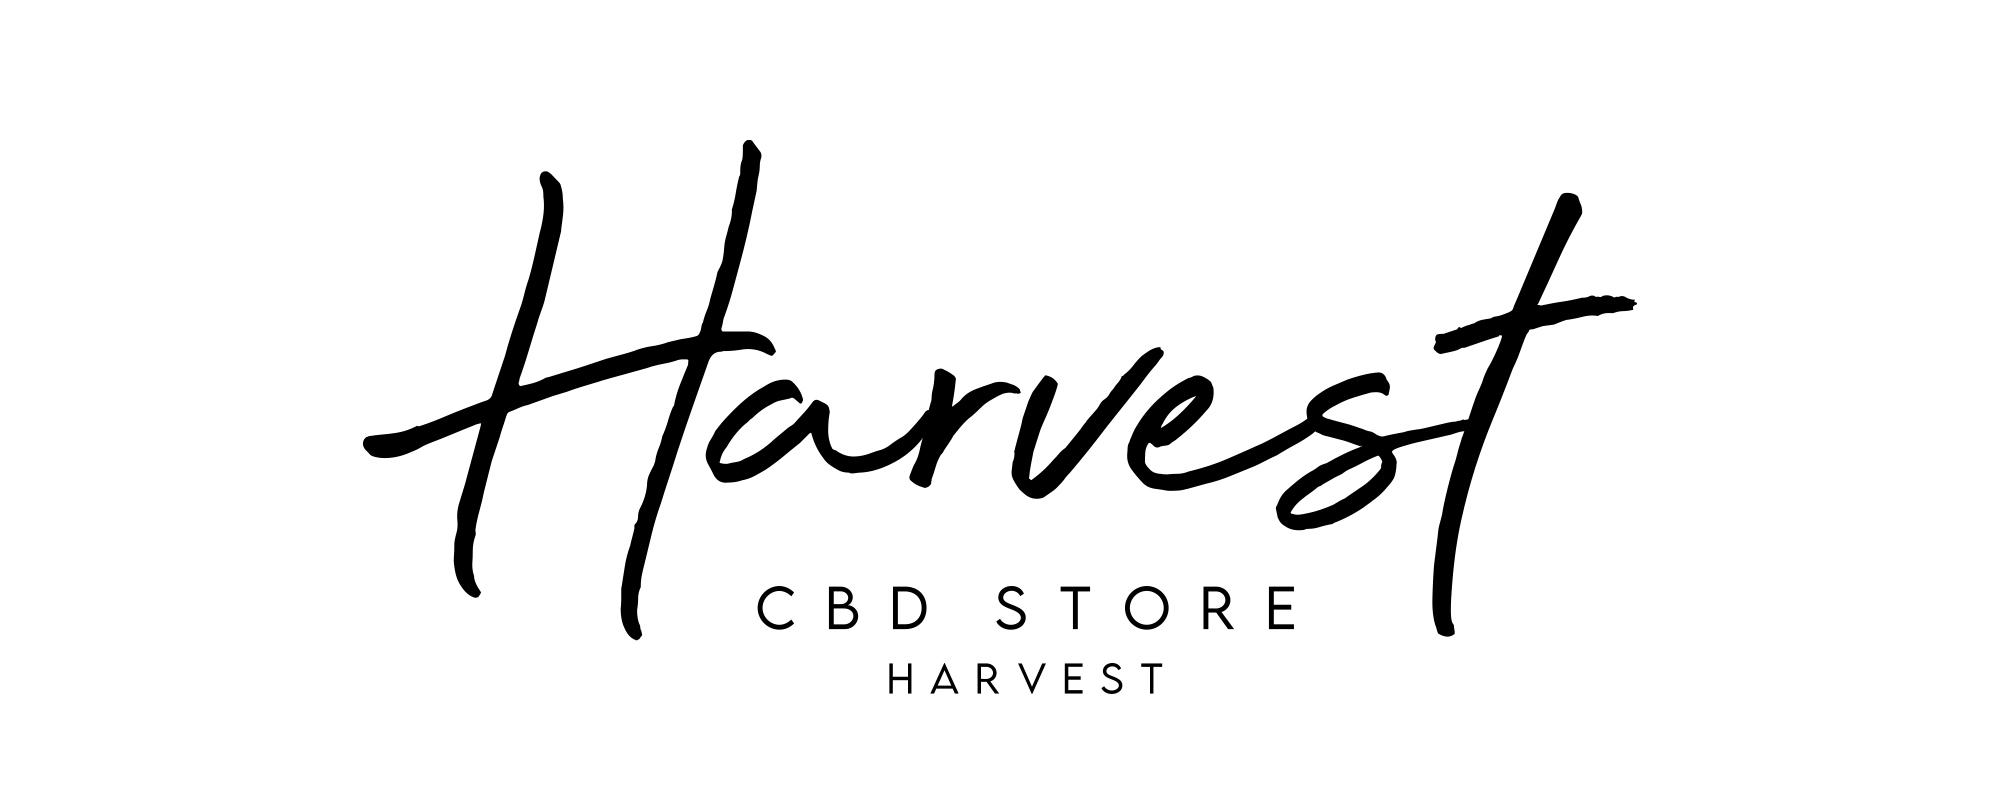 CBD STORE HARVEST